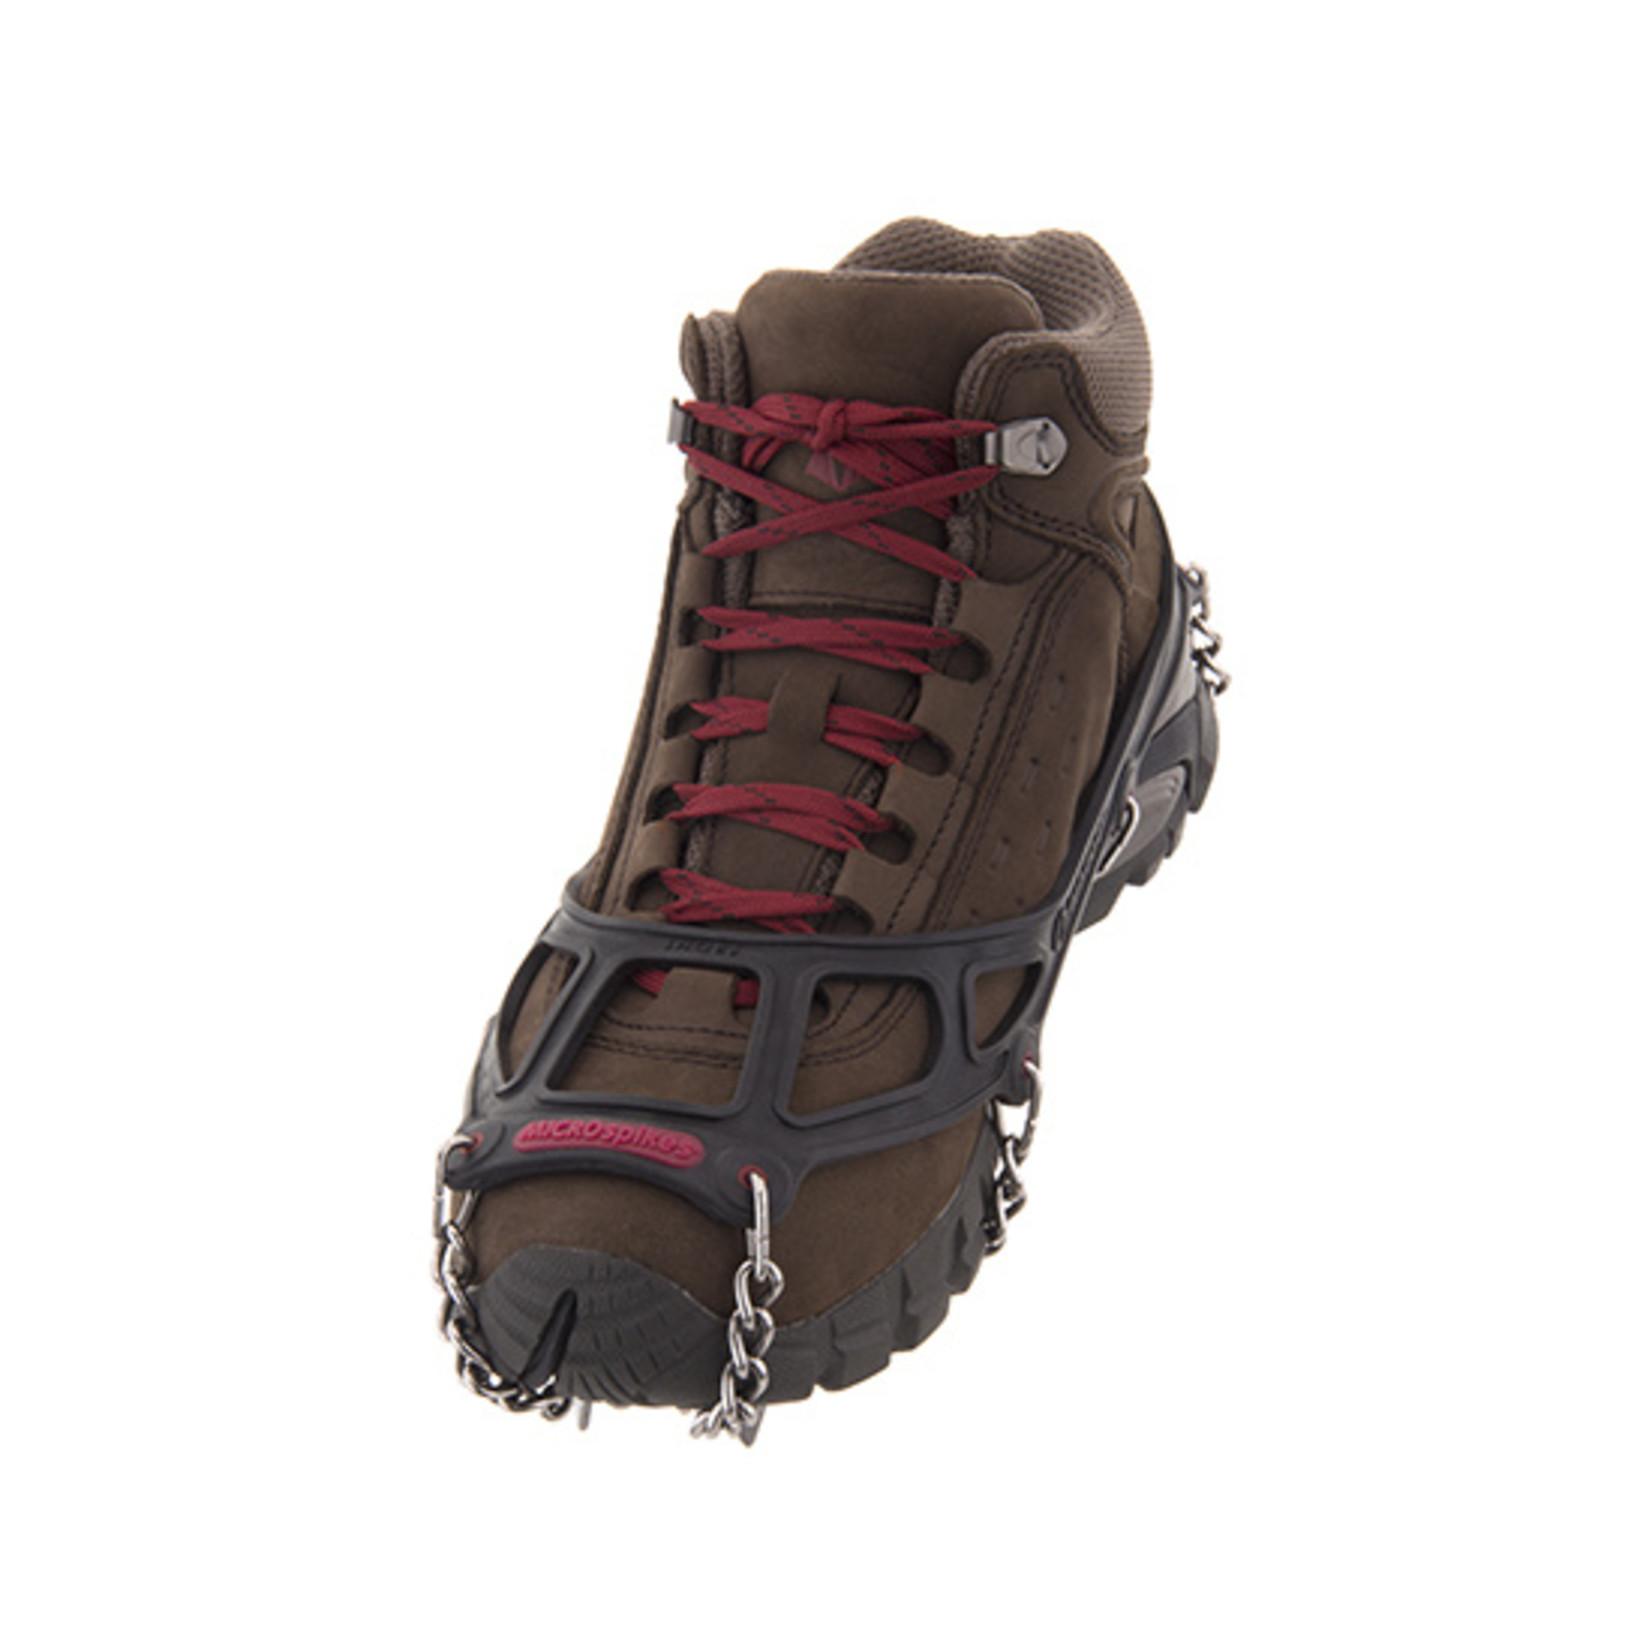 Kathoola MICROspikes® Footwear Traction